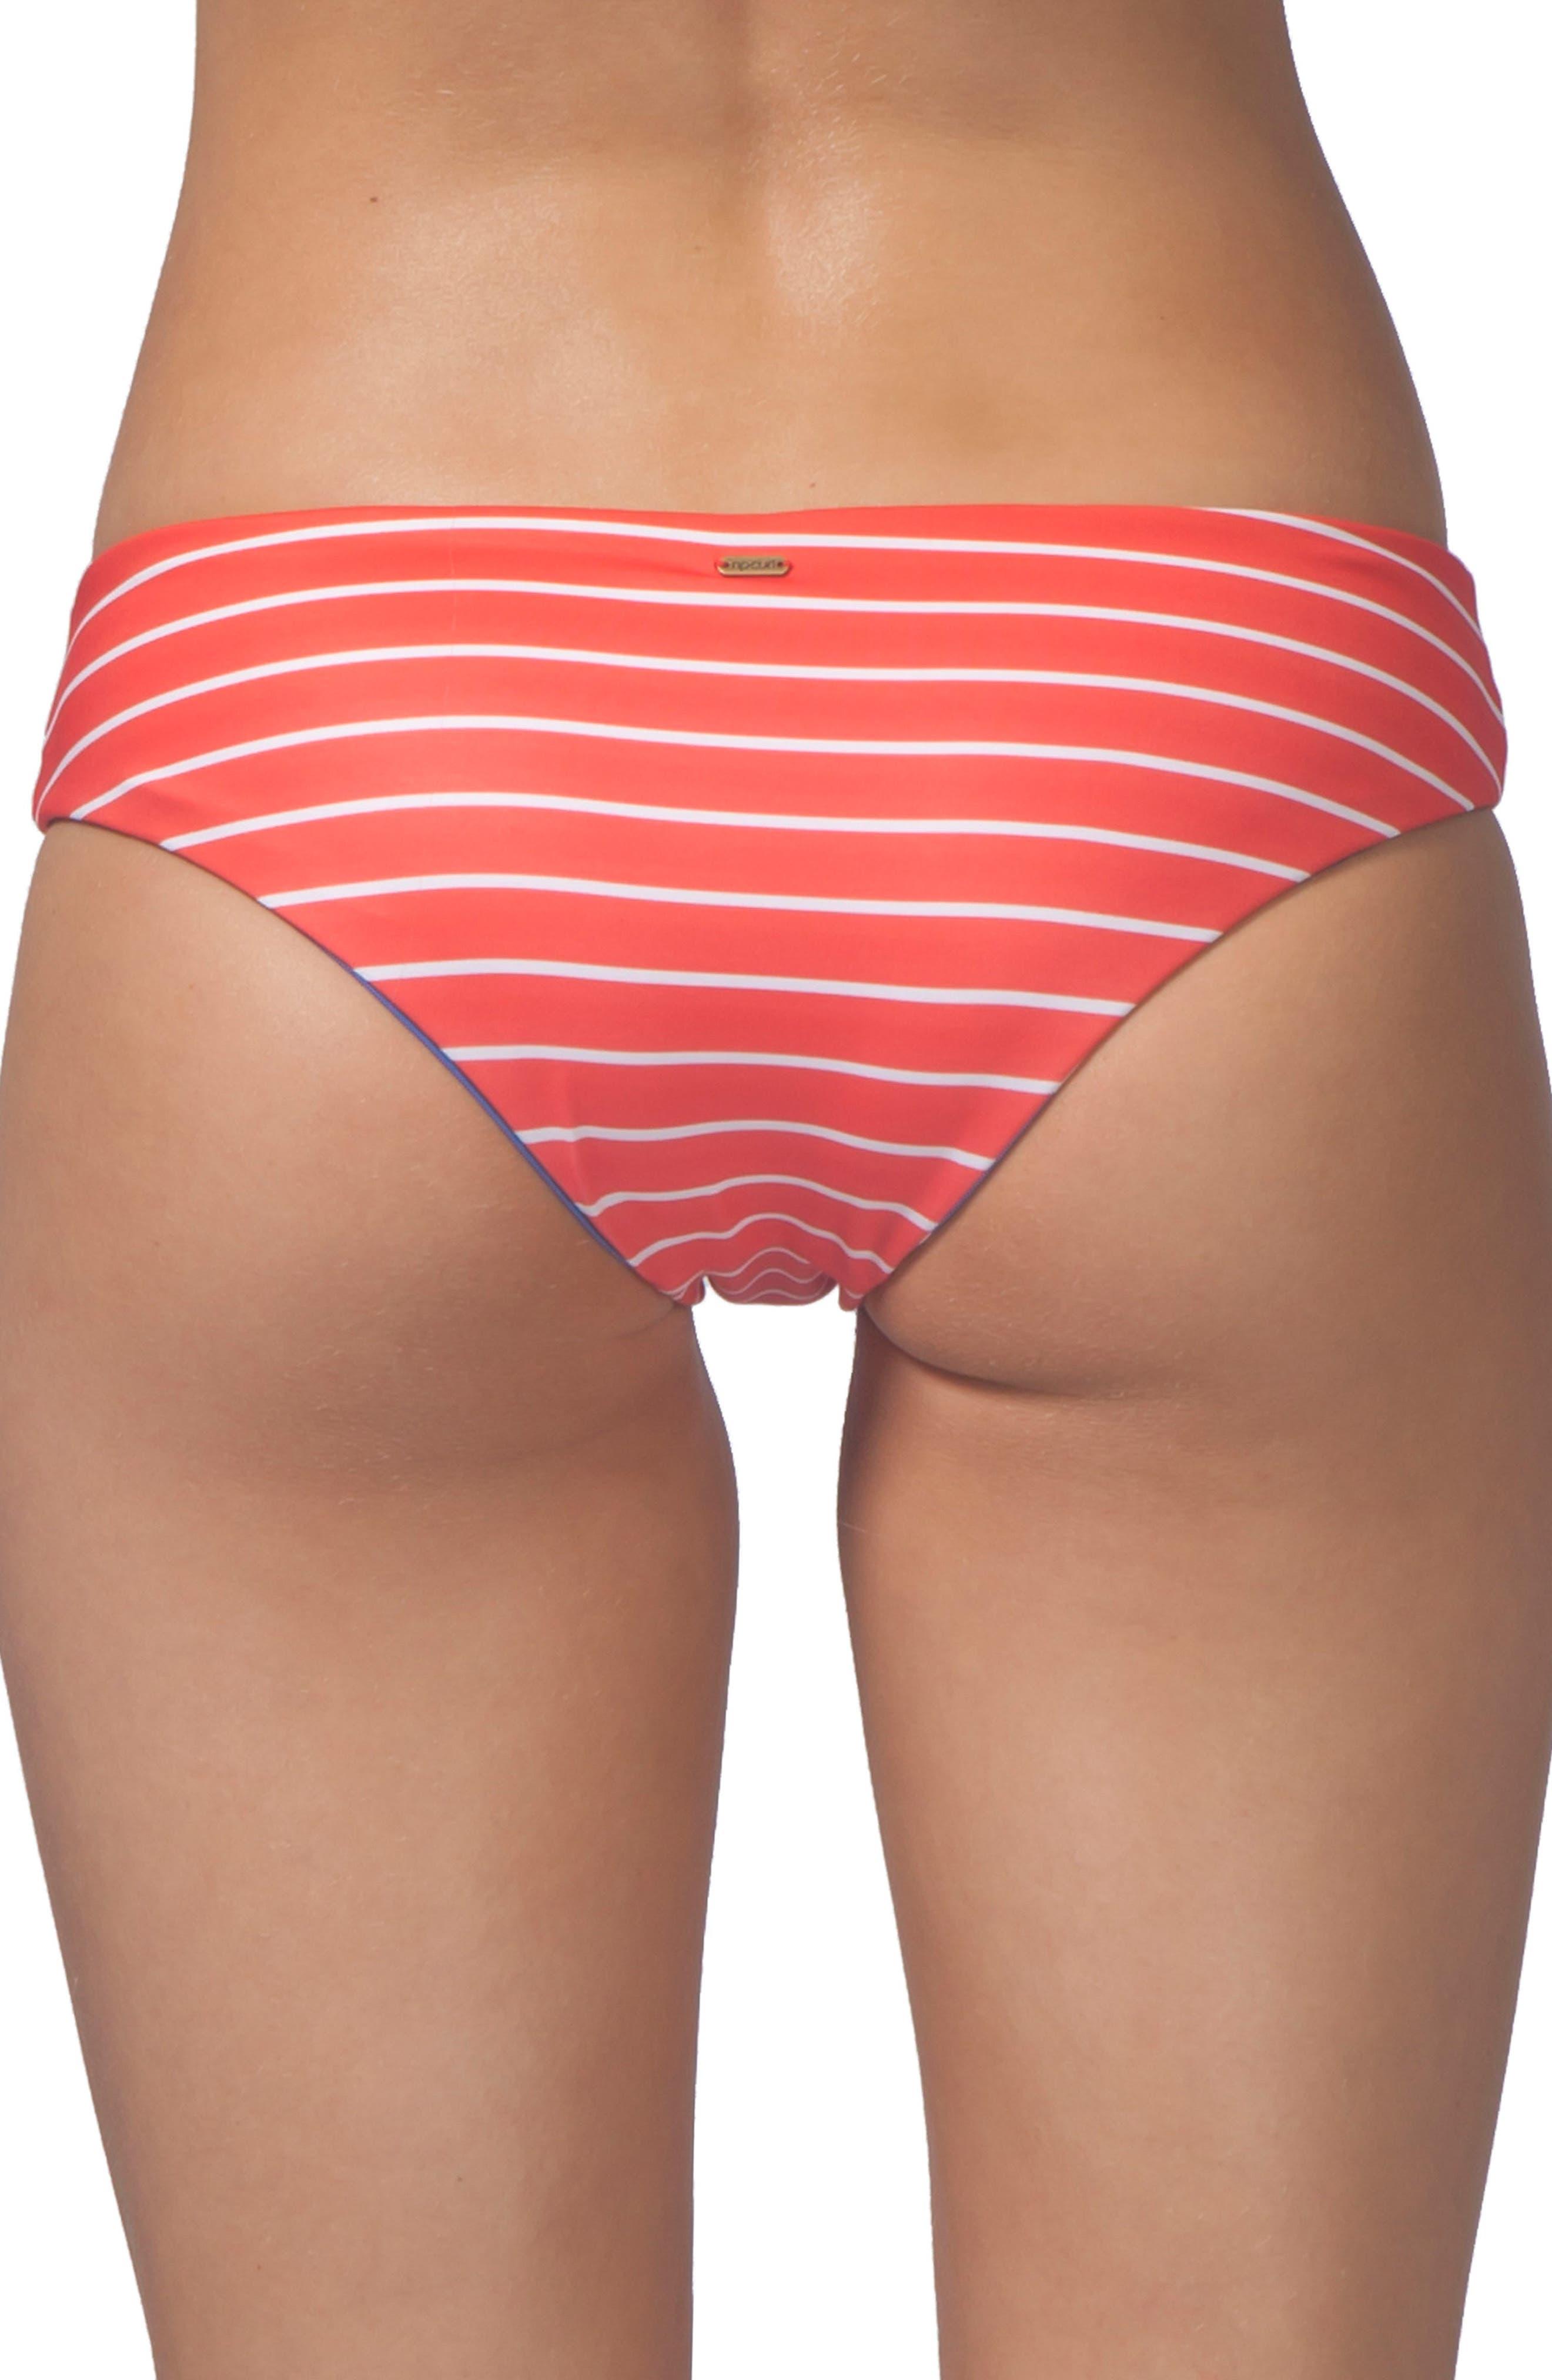 Main Image - Rip Curl Rising Star Reversible Hipster Bikini Bottoms